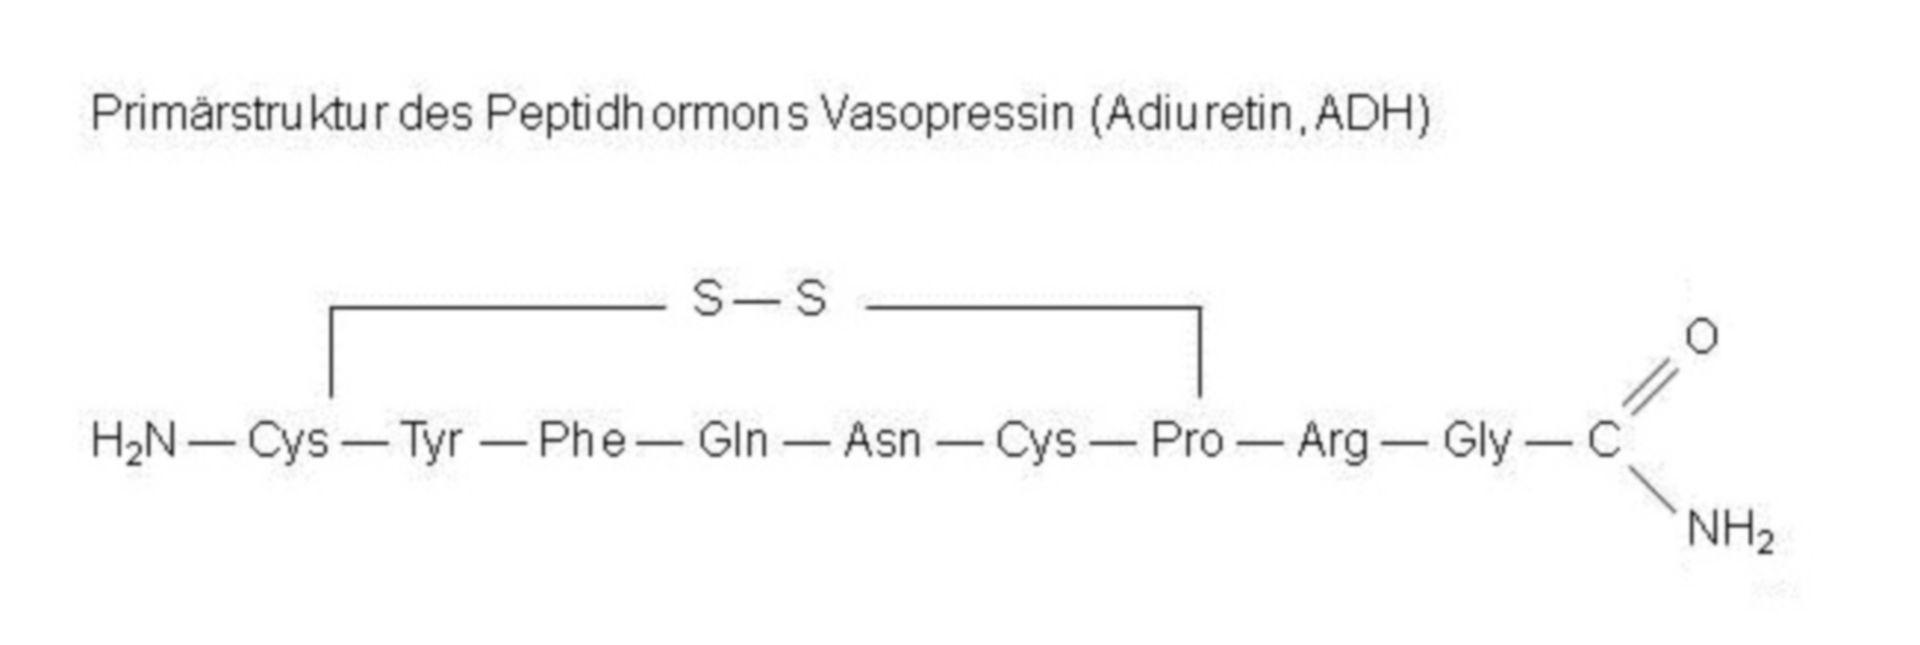 Primärstruktur - Peptidhormon Vasopressin